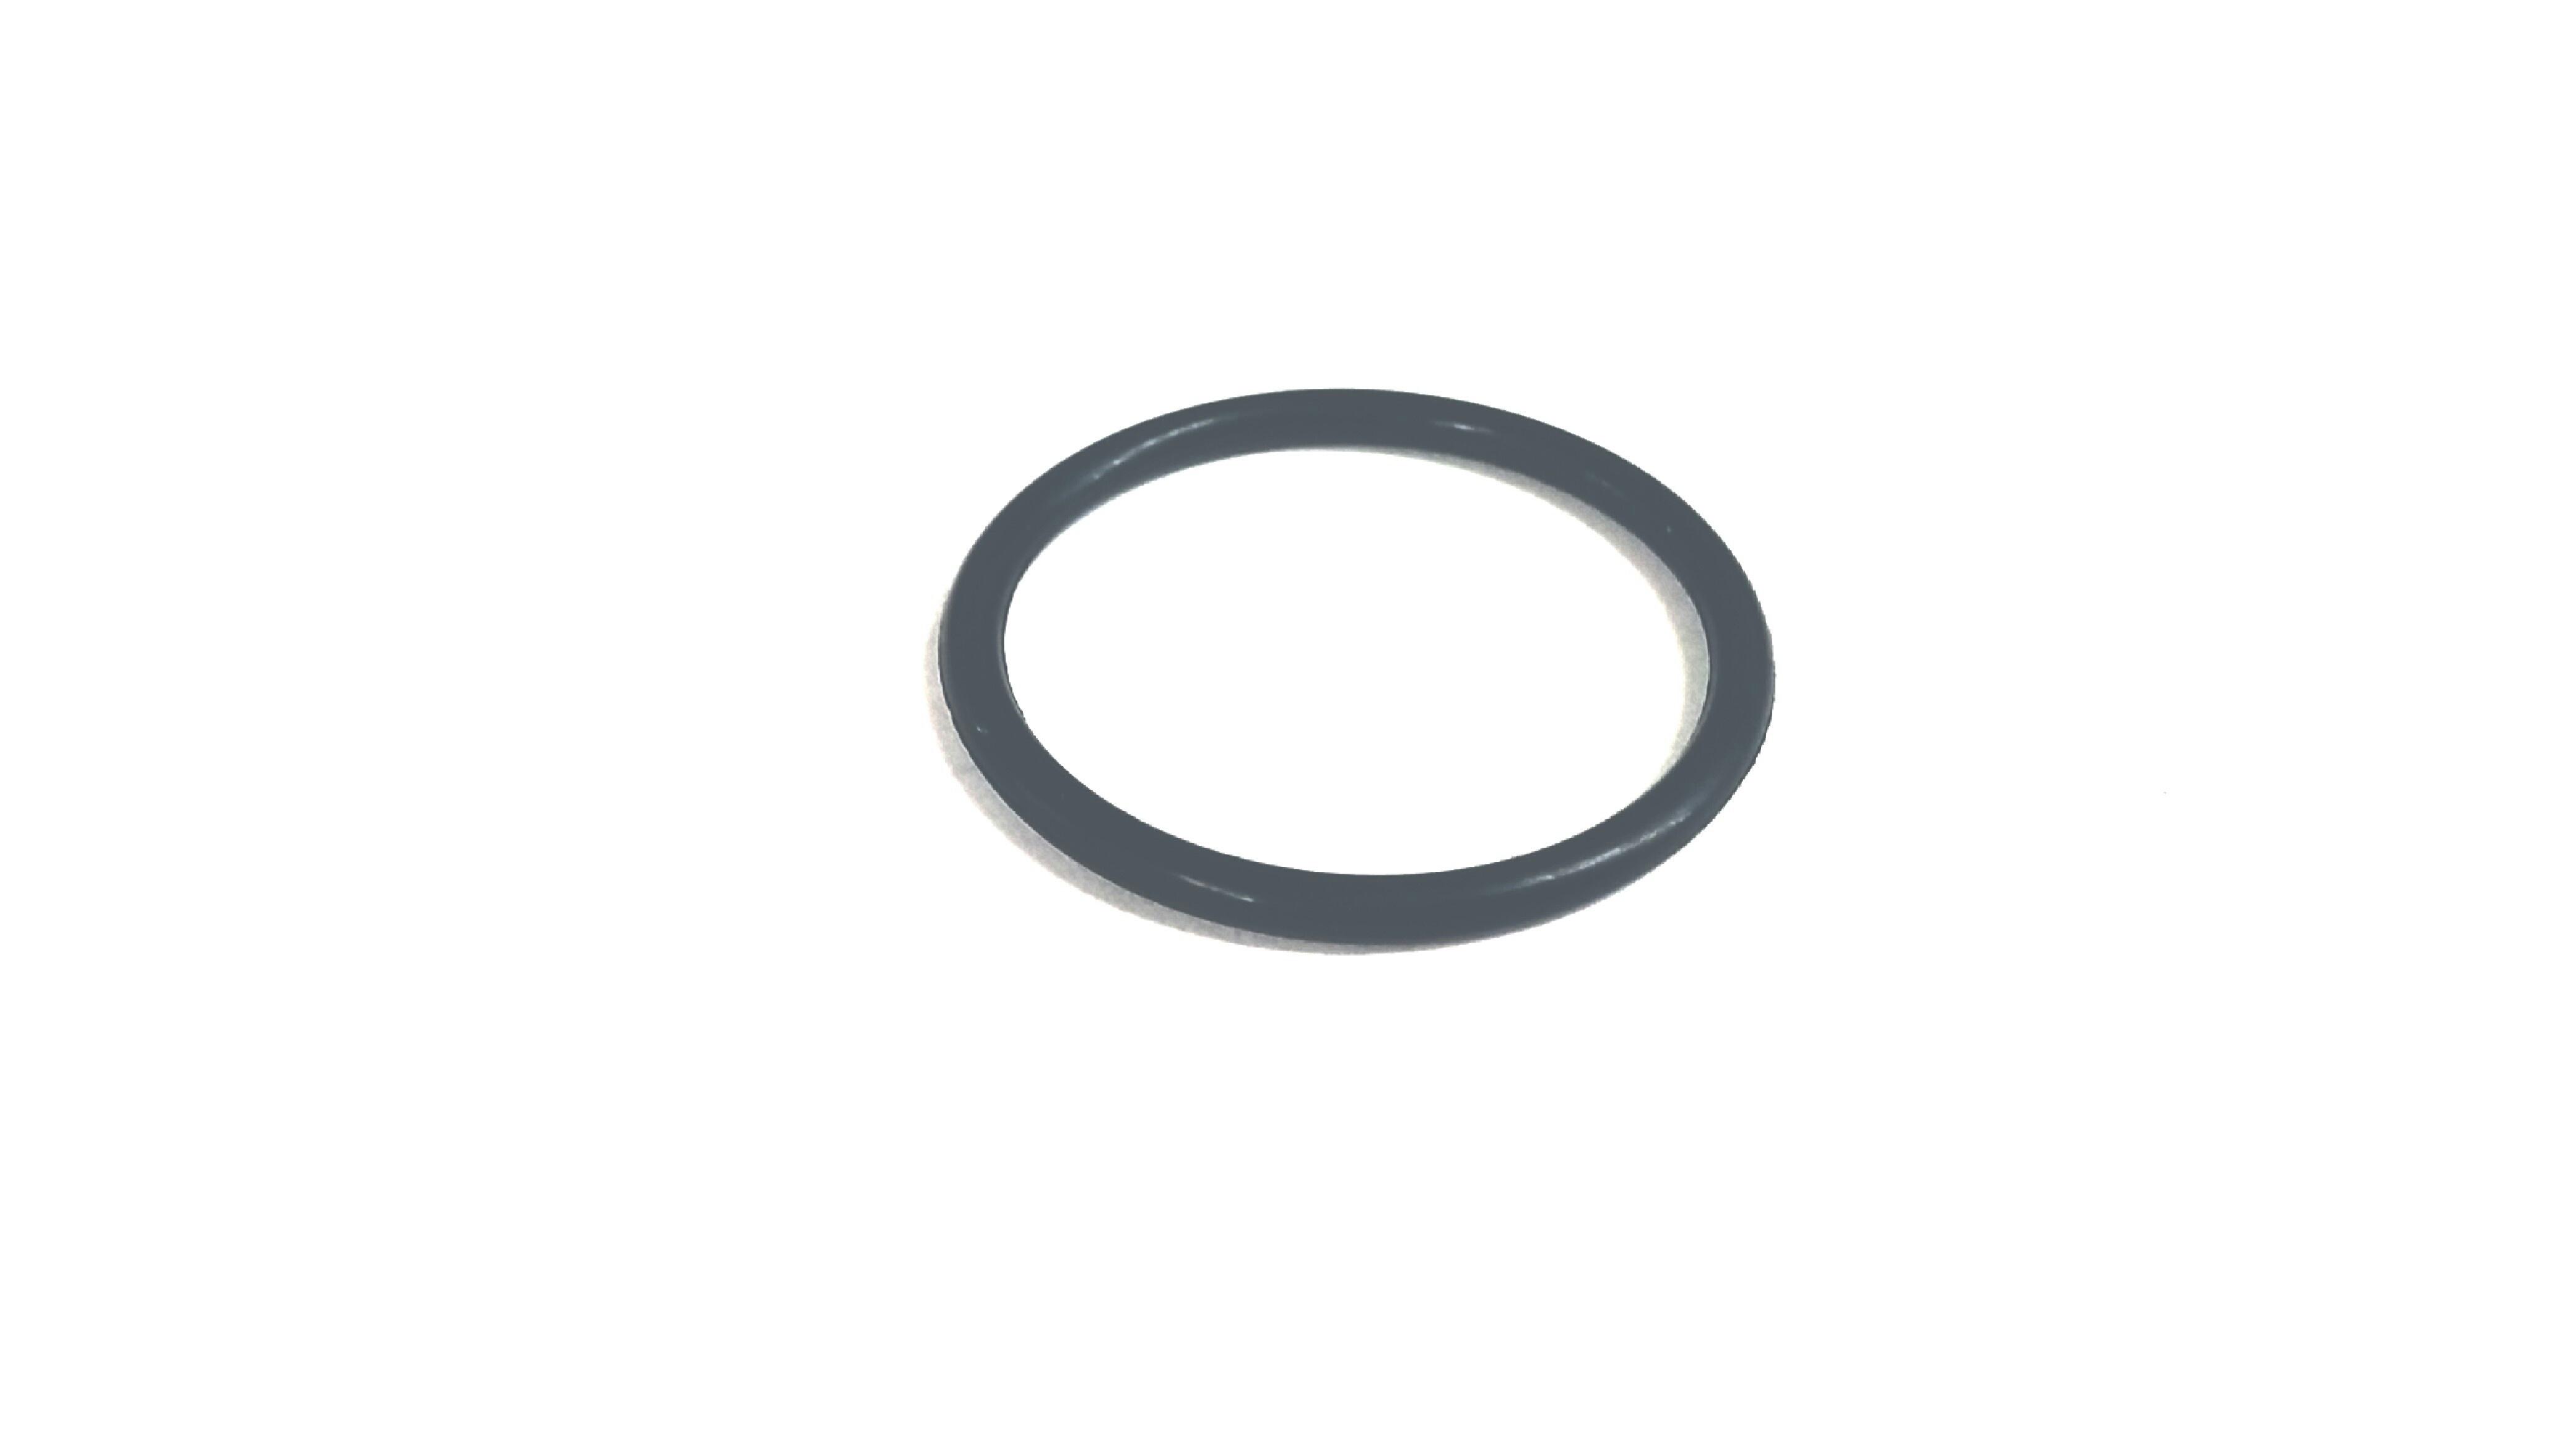 Carter Subaru Shoreline >> 062620280 - O ring - Genuine Subaru Part